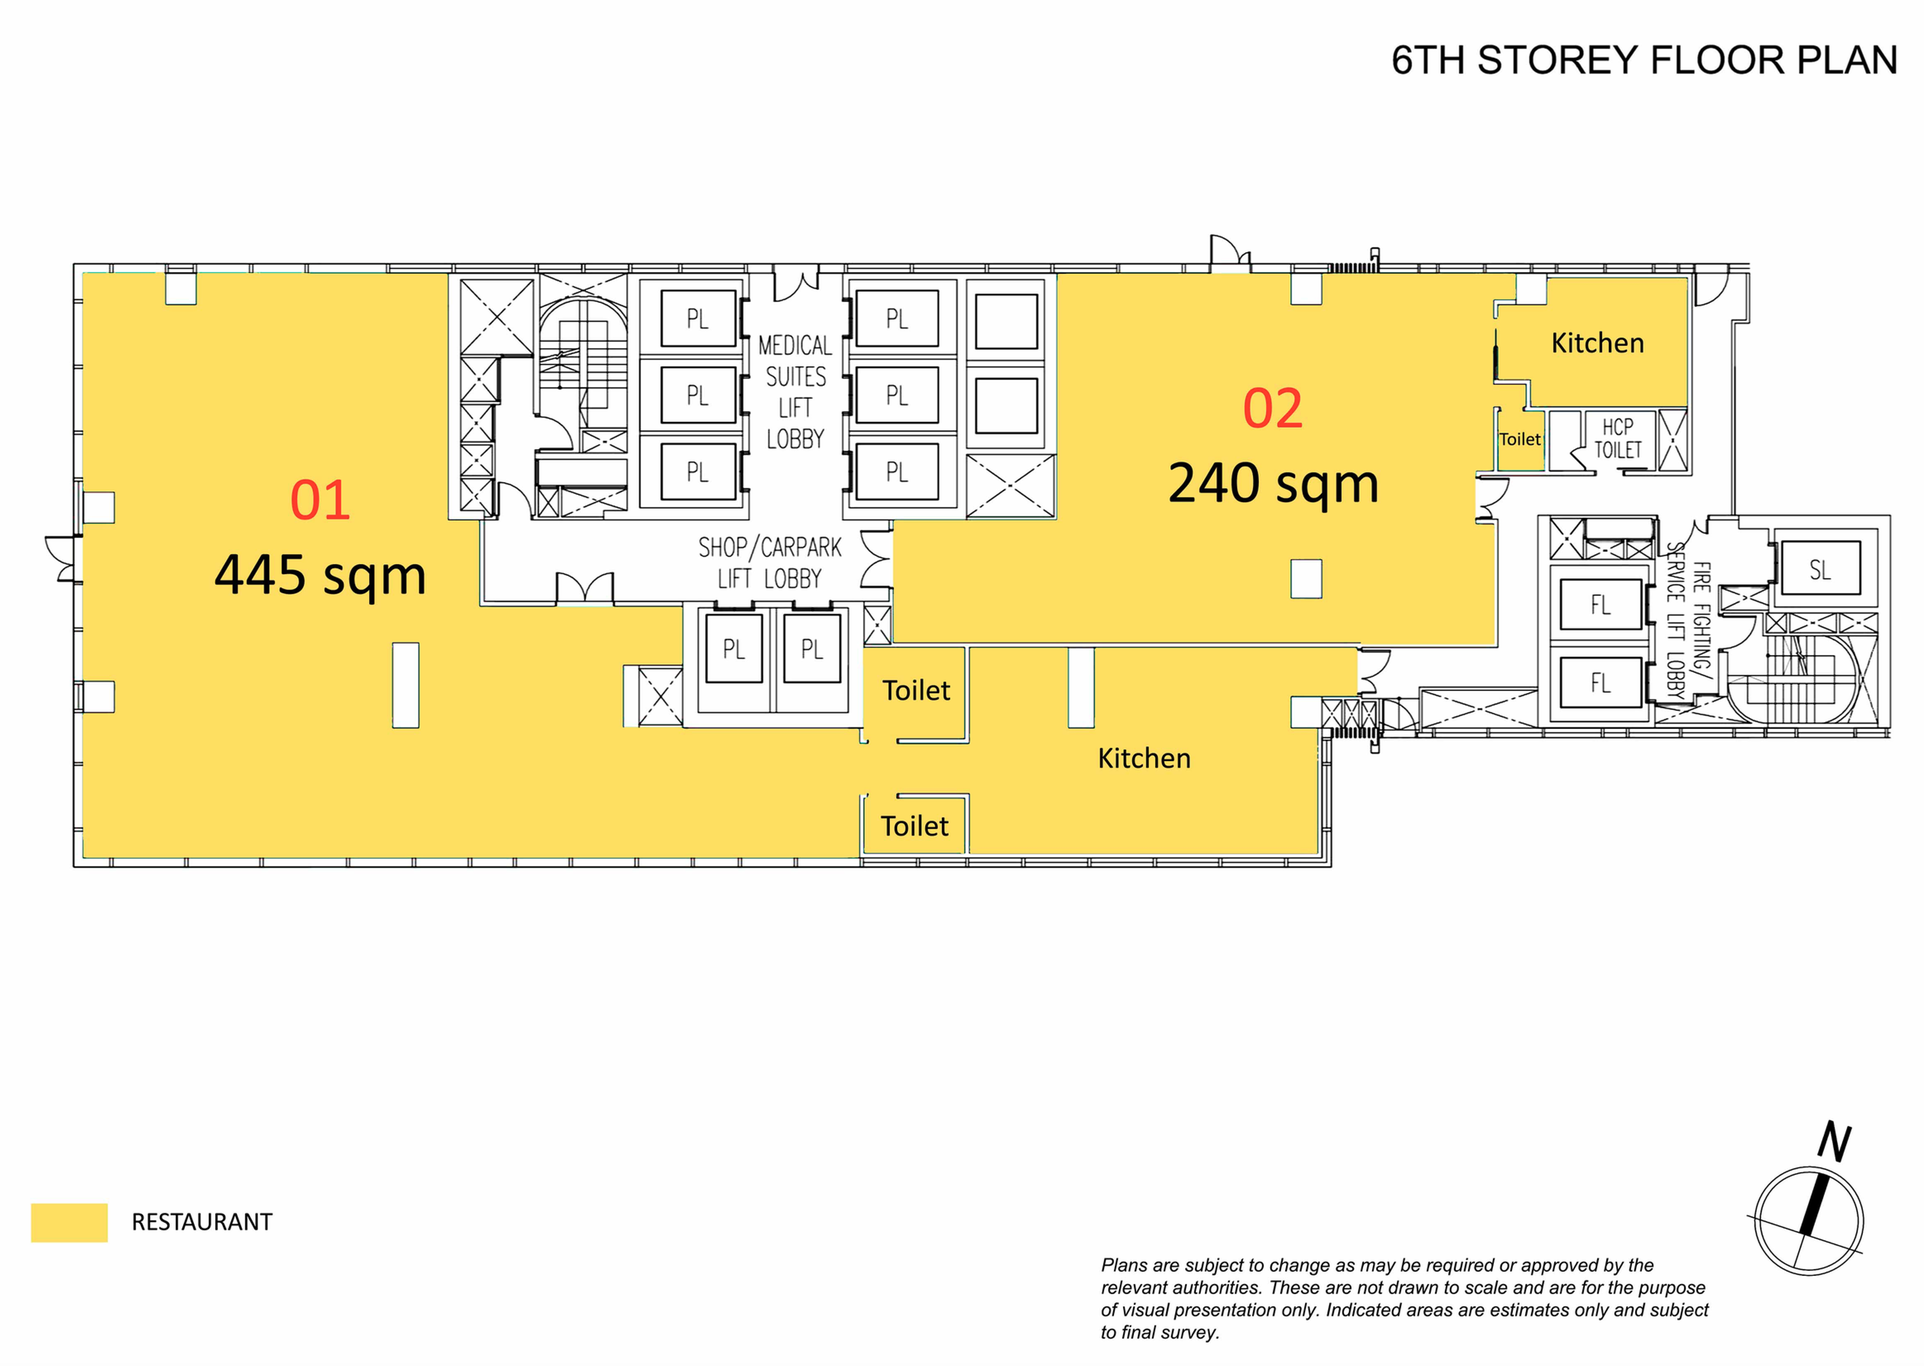 6th Storey Floor Plan